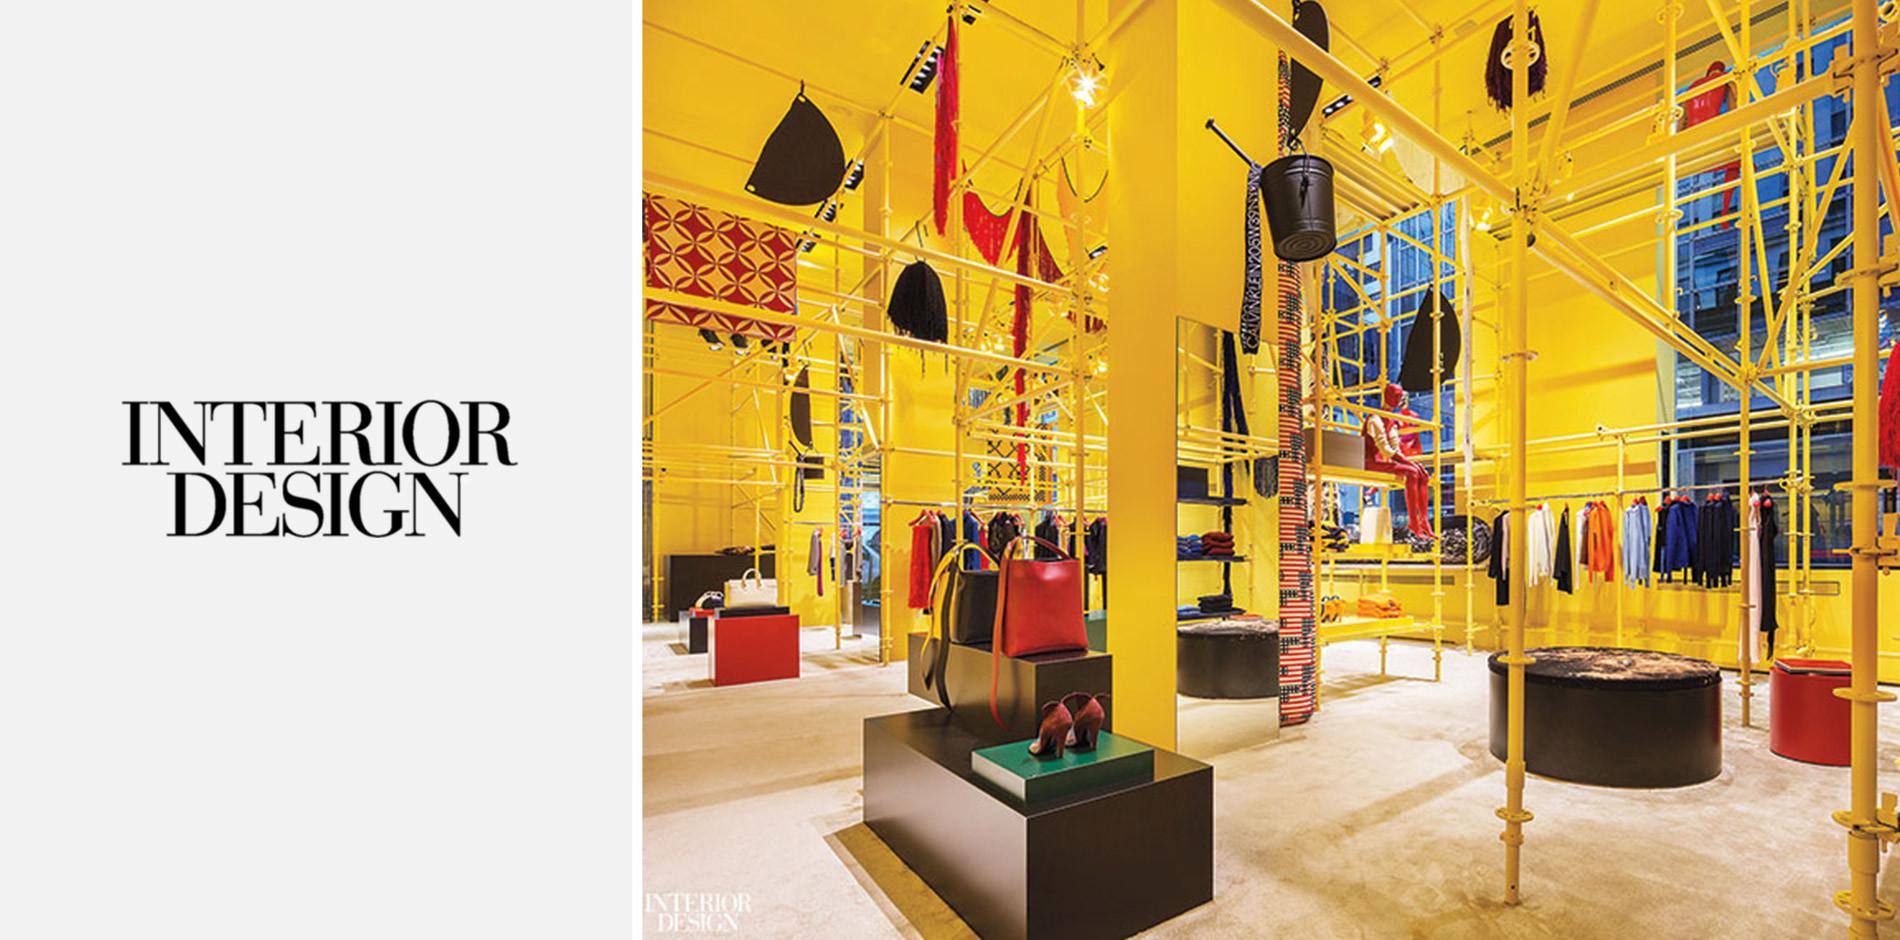 & Interior Design Showcases Calvin Kleinu0027s NYC Flagship Redesign